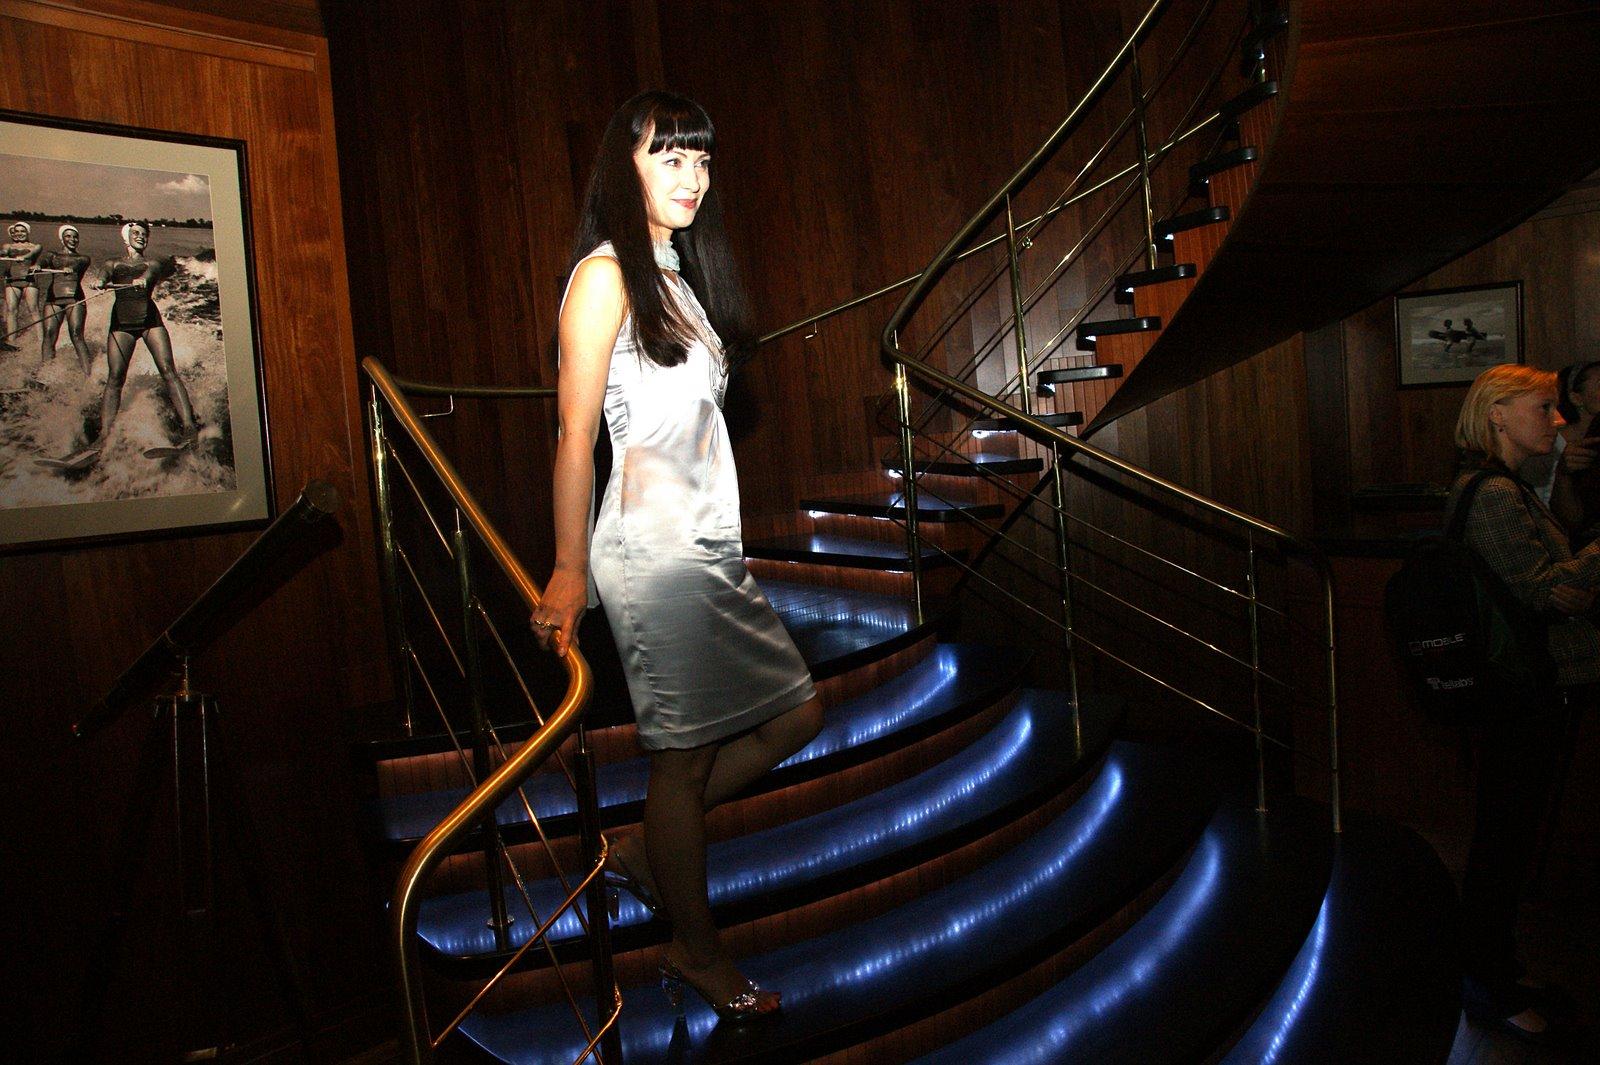 http://4.bp.blogspot.com/-mIw16k1JWqY/TsbXE1LQ53I/AAAAAAAABe4/KRtWSSrjWI0/s1600/nonna+grishayeva+russian+actress+4.jpg